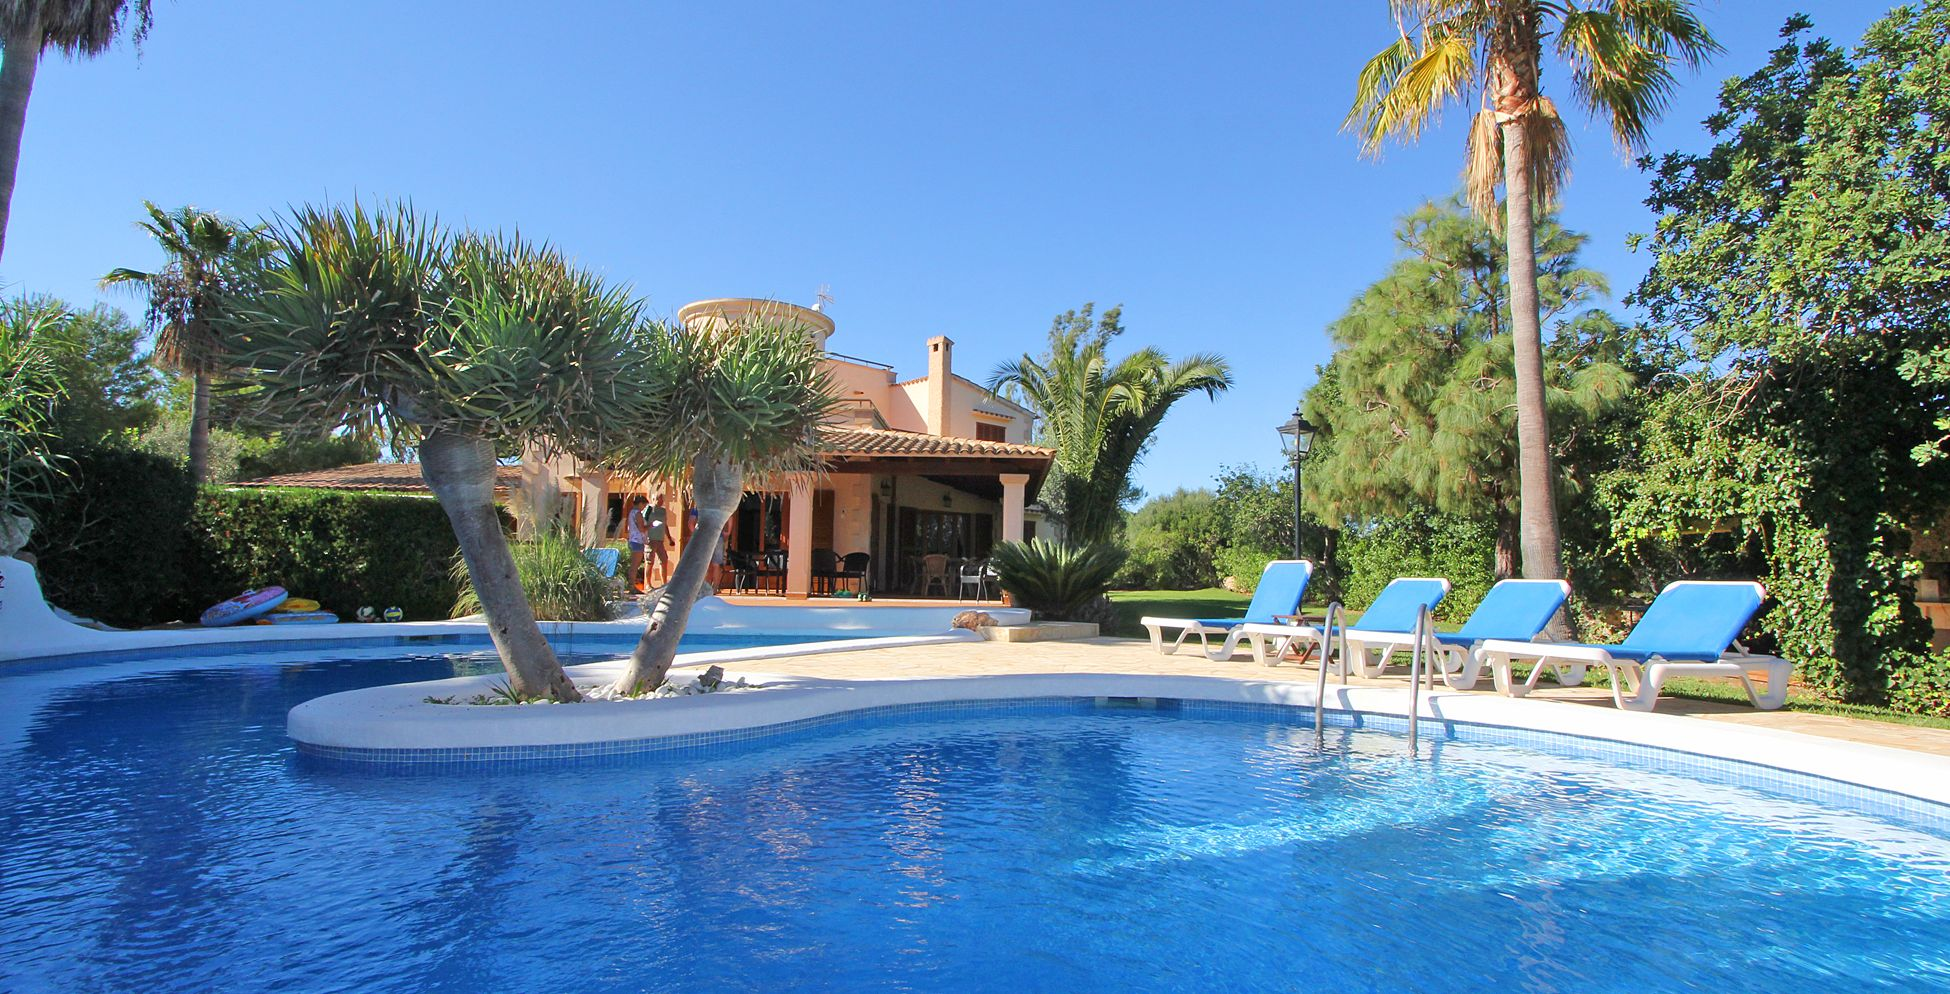 ferienhaus mallorca ma5670 strandnah mit pool zu mieten. Black Bedroom Furniture Sets. Home Design Ideas